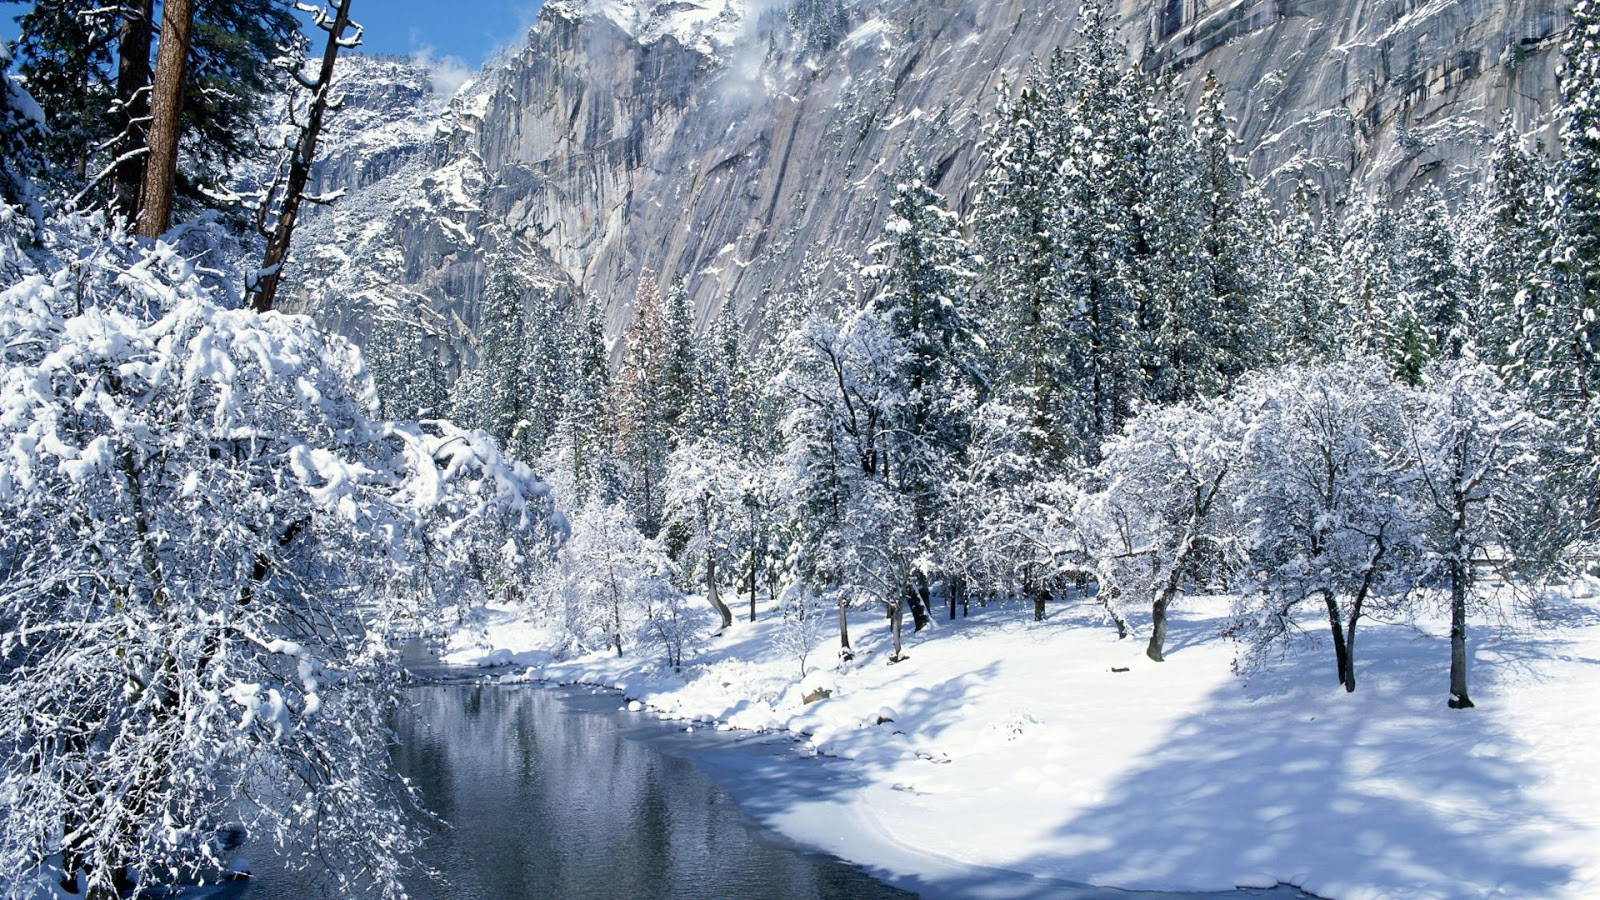 winter snowfall beautiful wallpaper beauty of nature in winter 1600x900